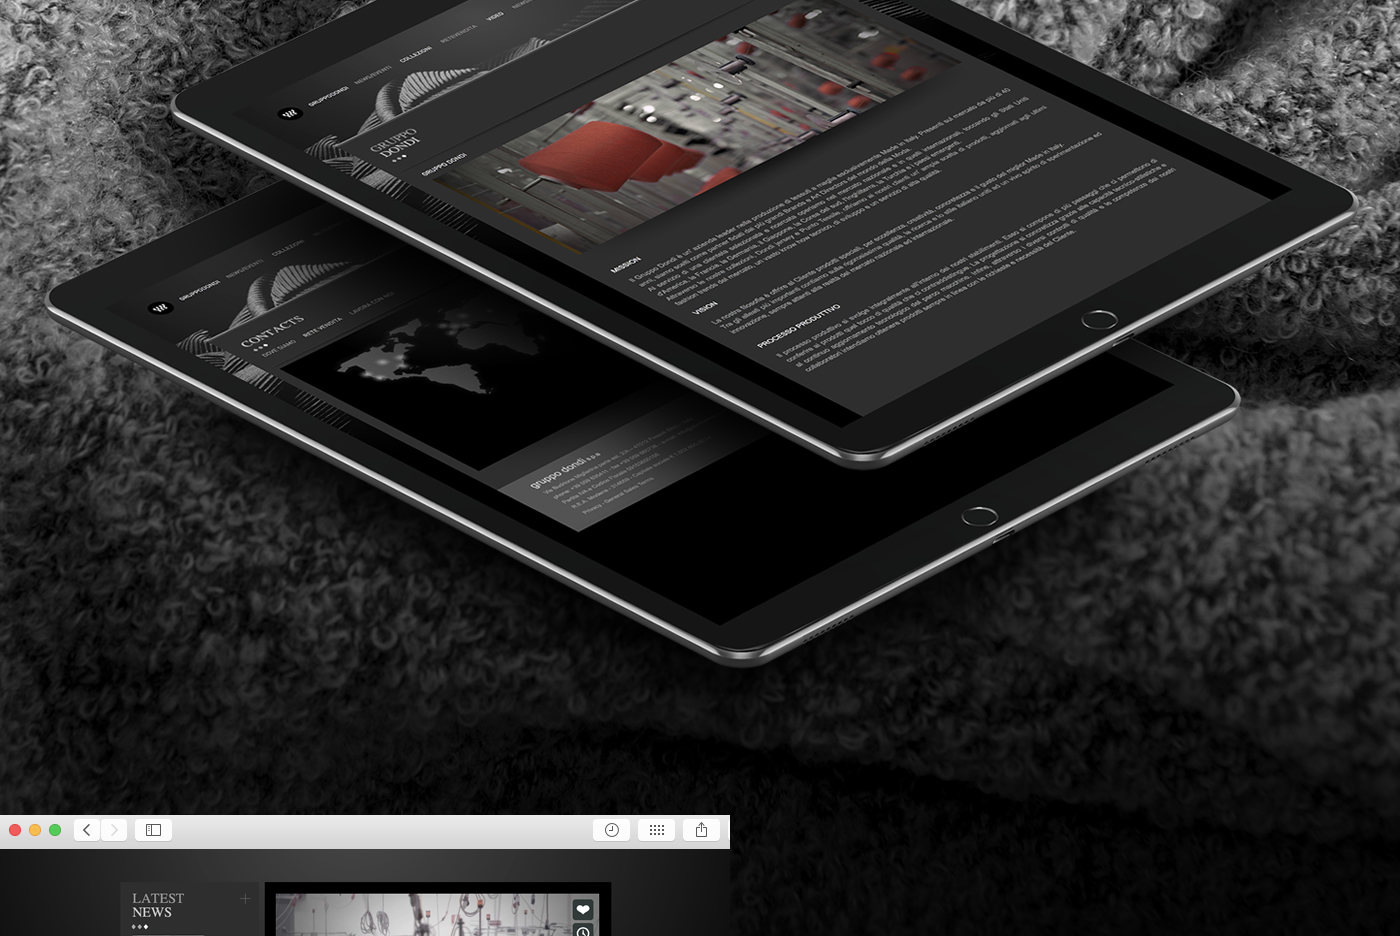 gruppo dondi tailor made filati company website moda design Webdesign